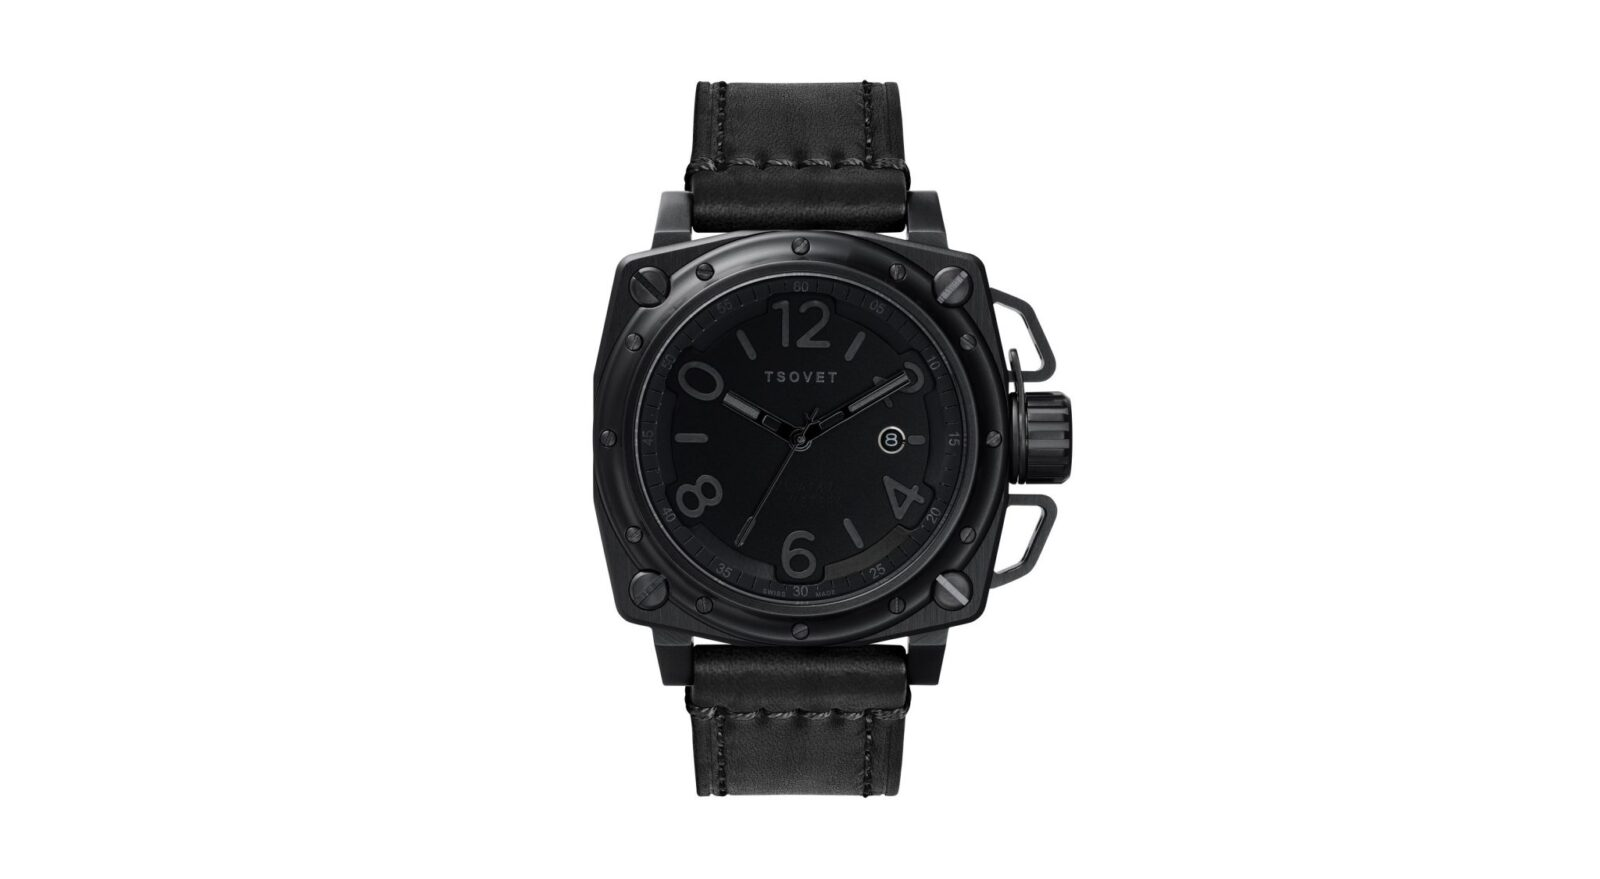 Tsovet Watch 1600x879 - Tsovet SVT-AX87